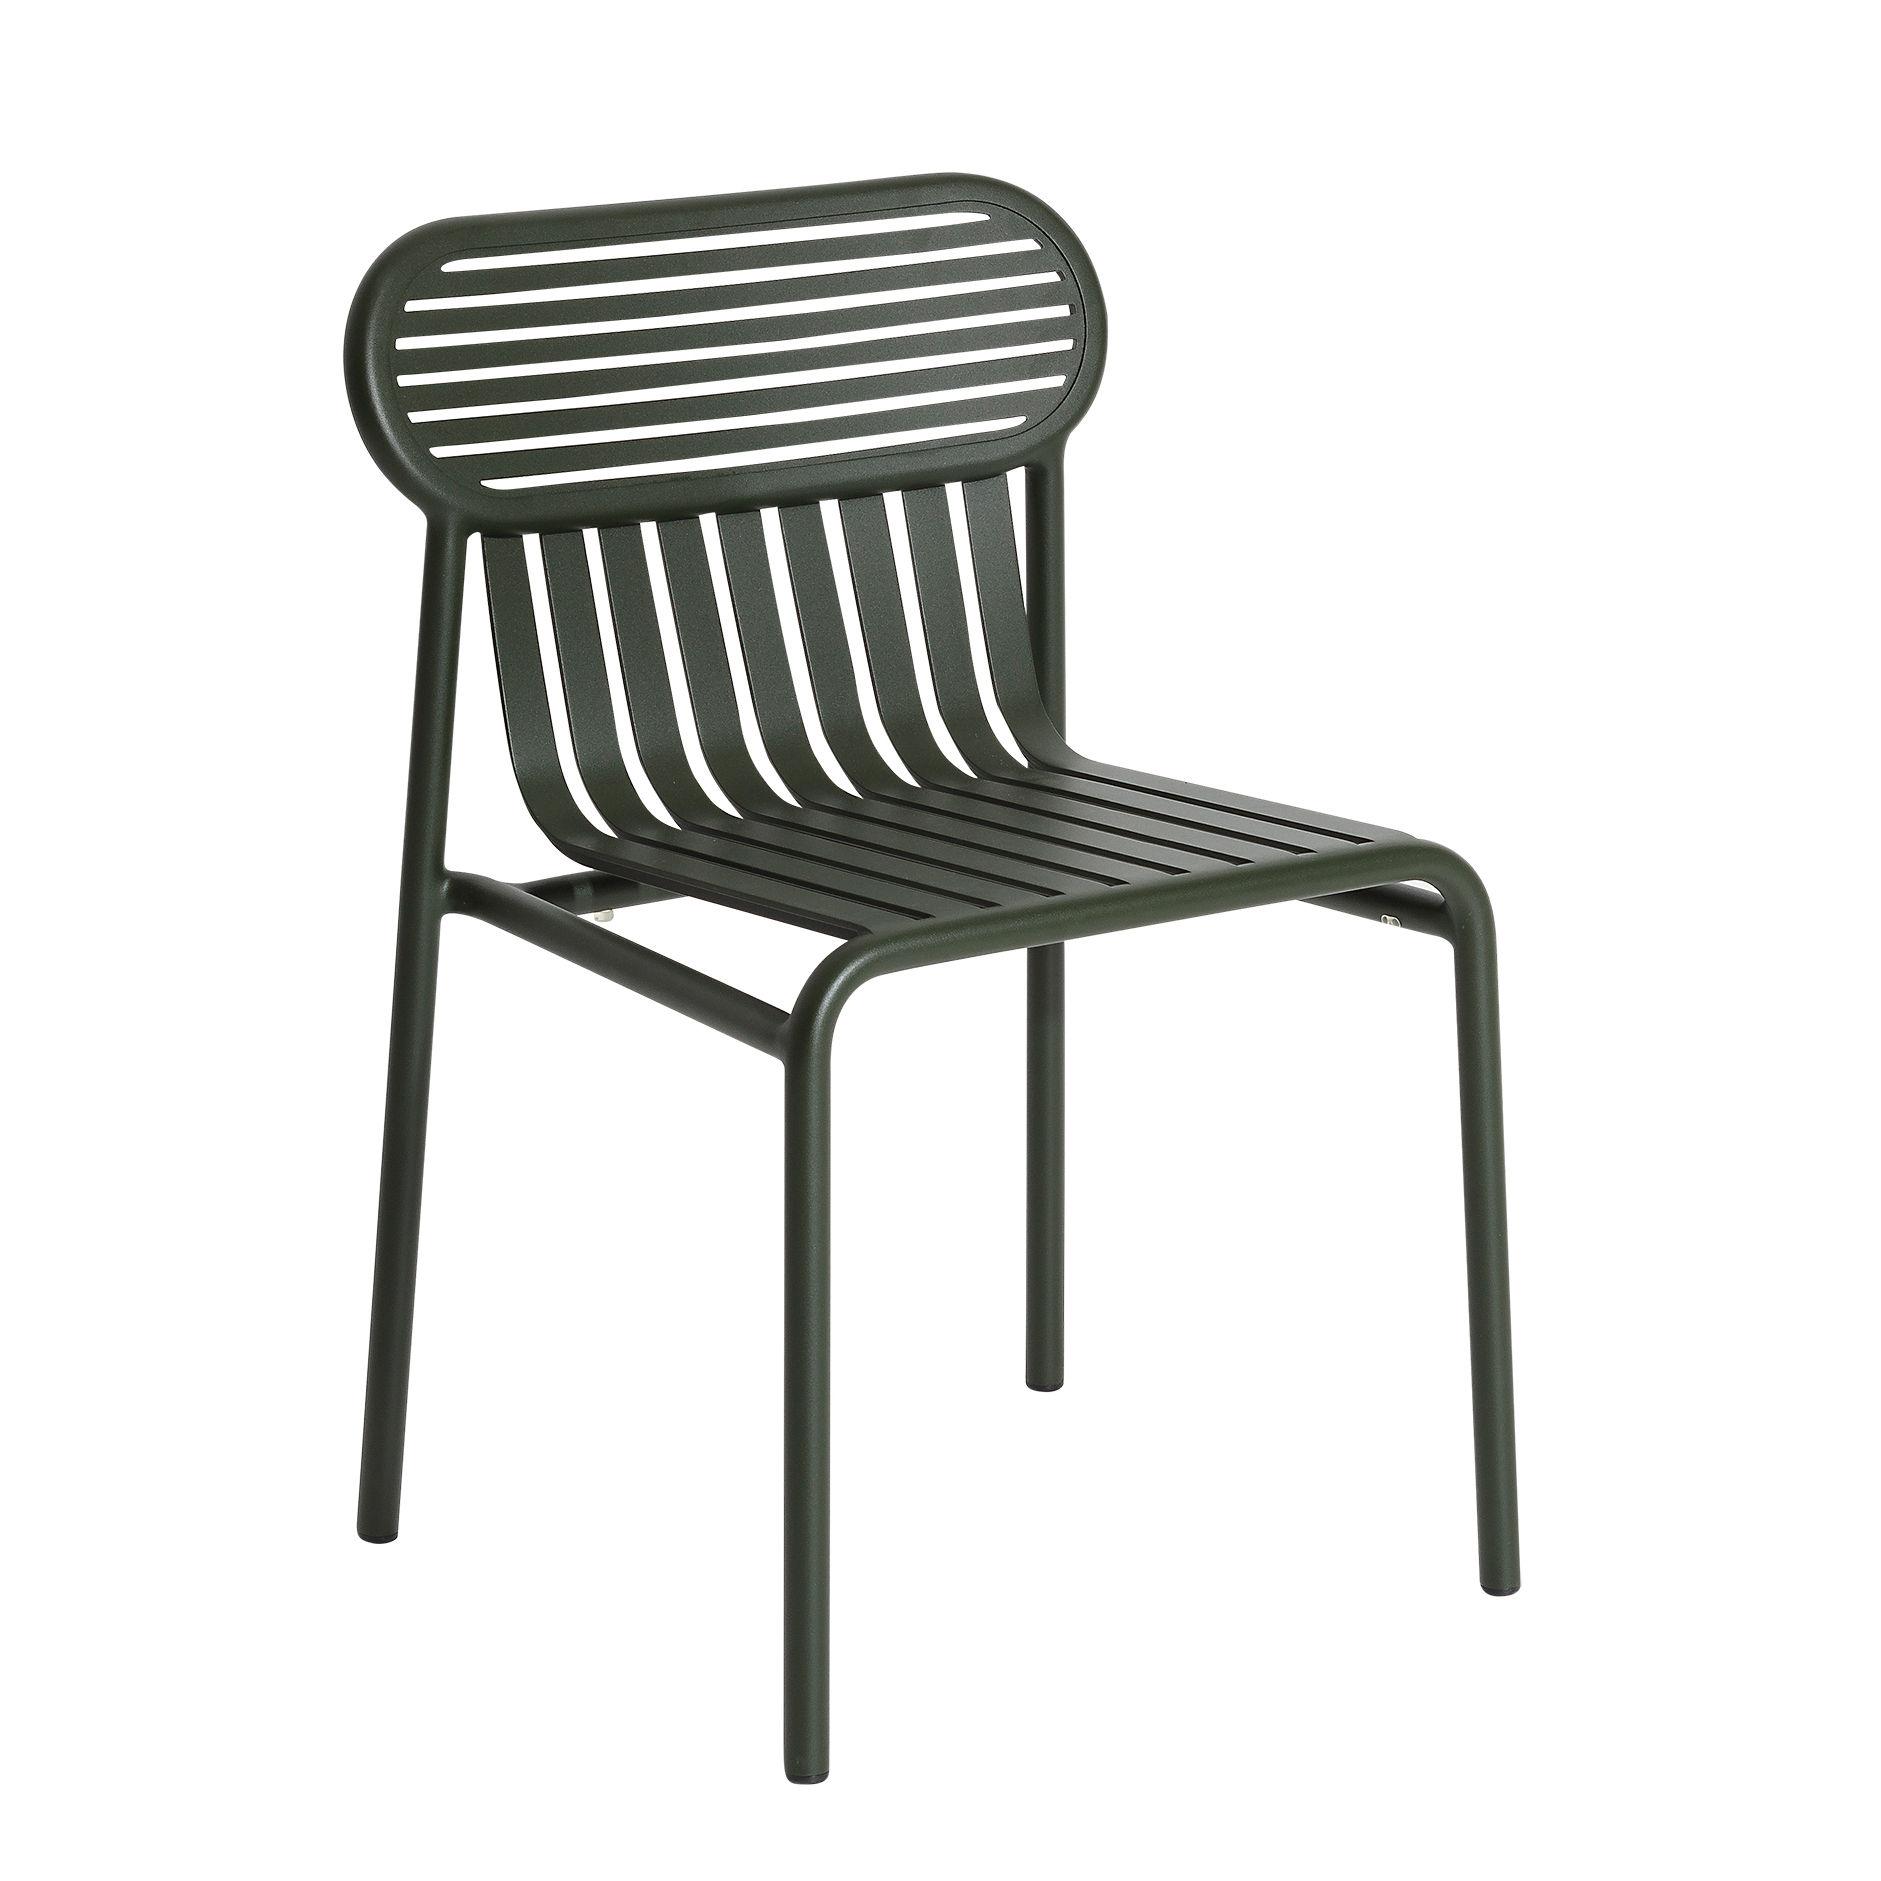 Chaise empilable Week-End / Aluminium - Petite Friture vert en métal